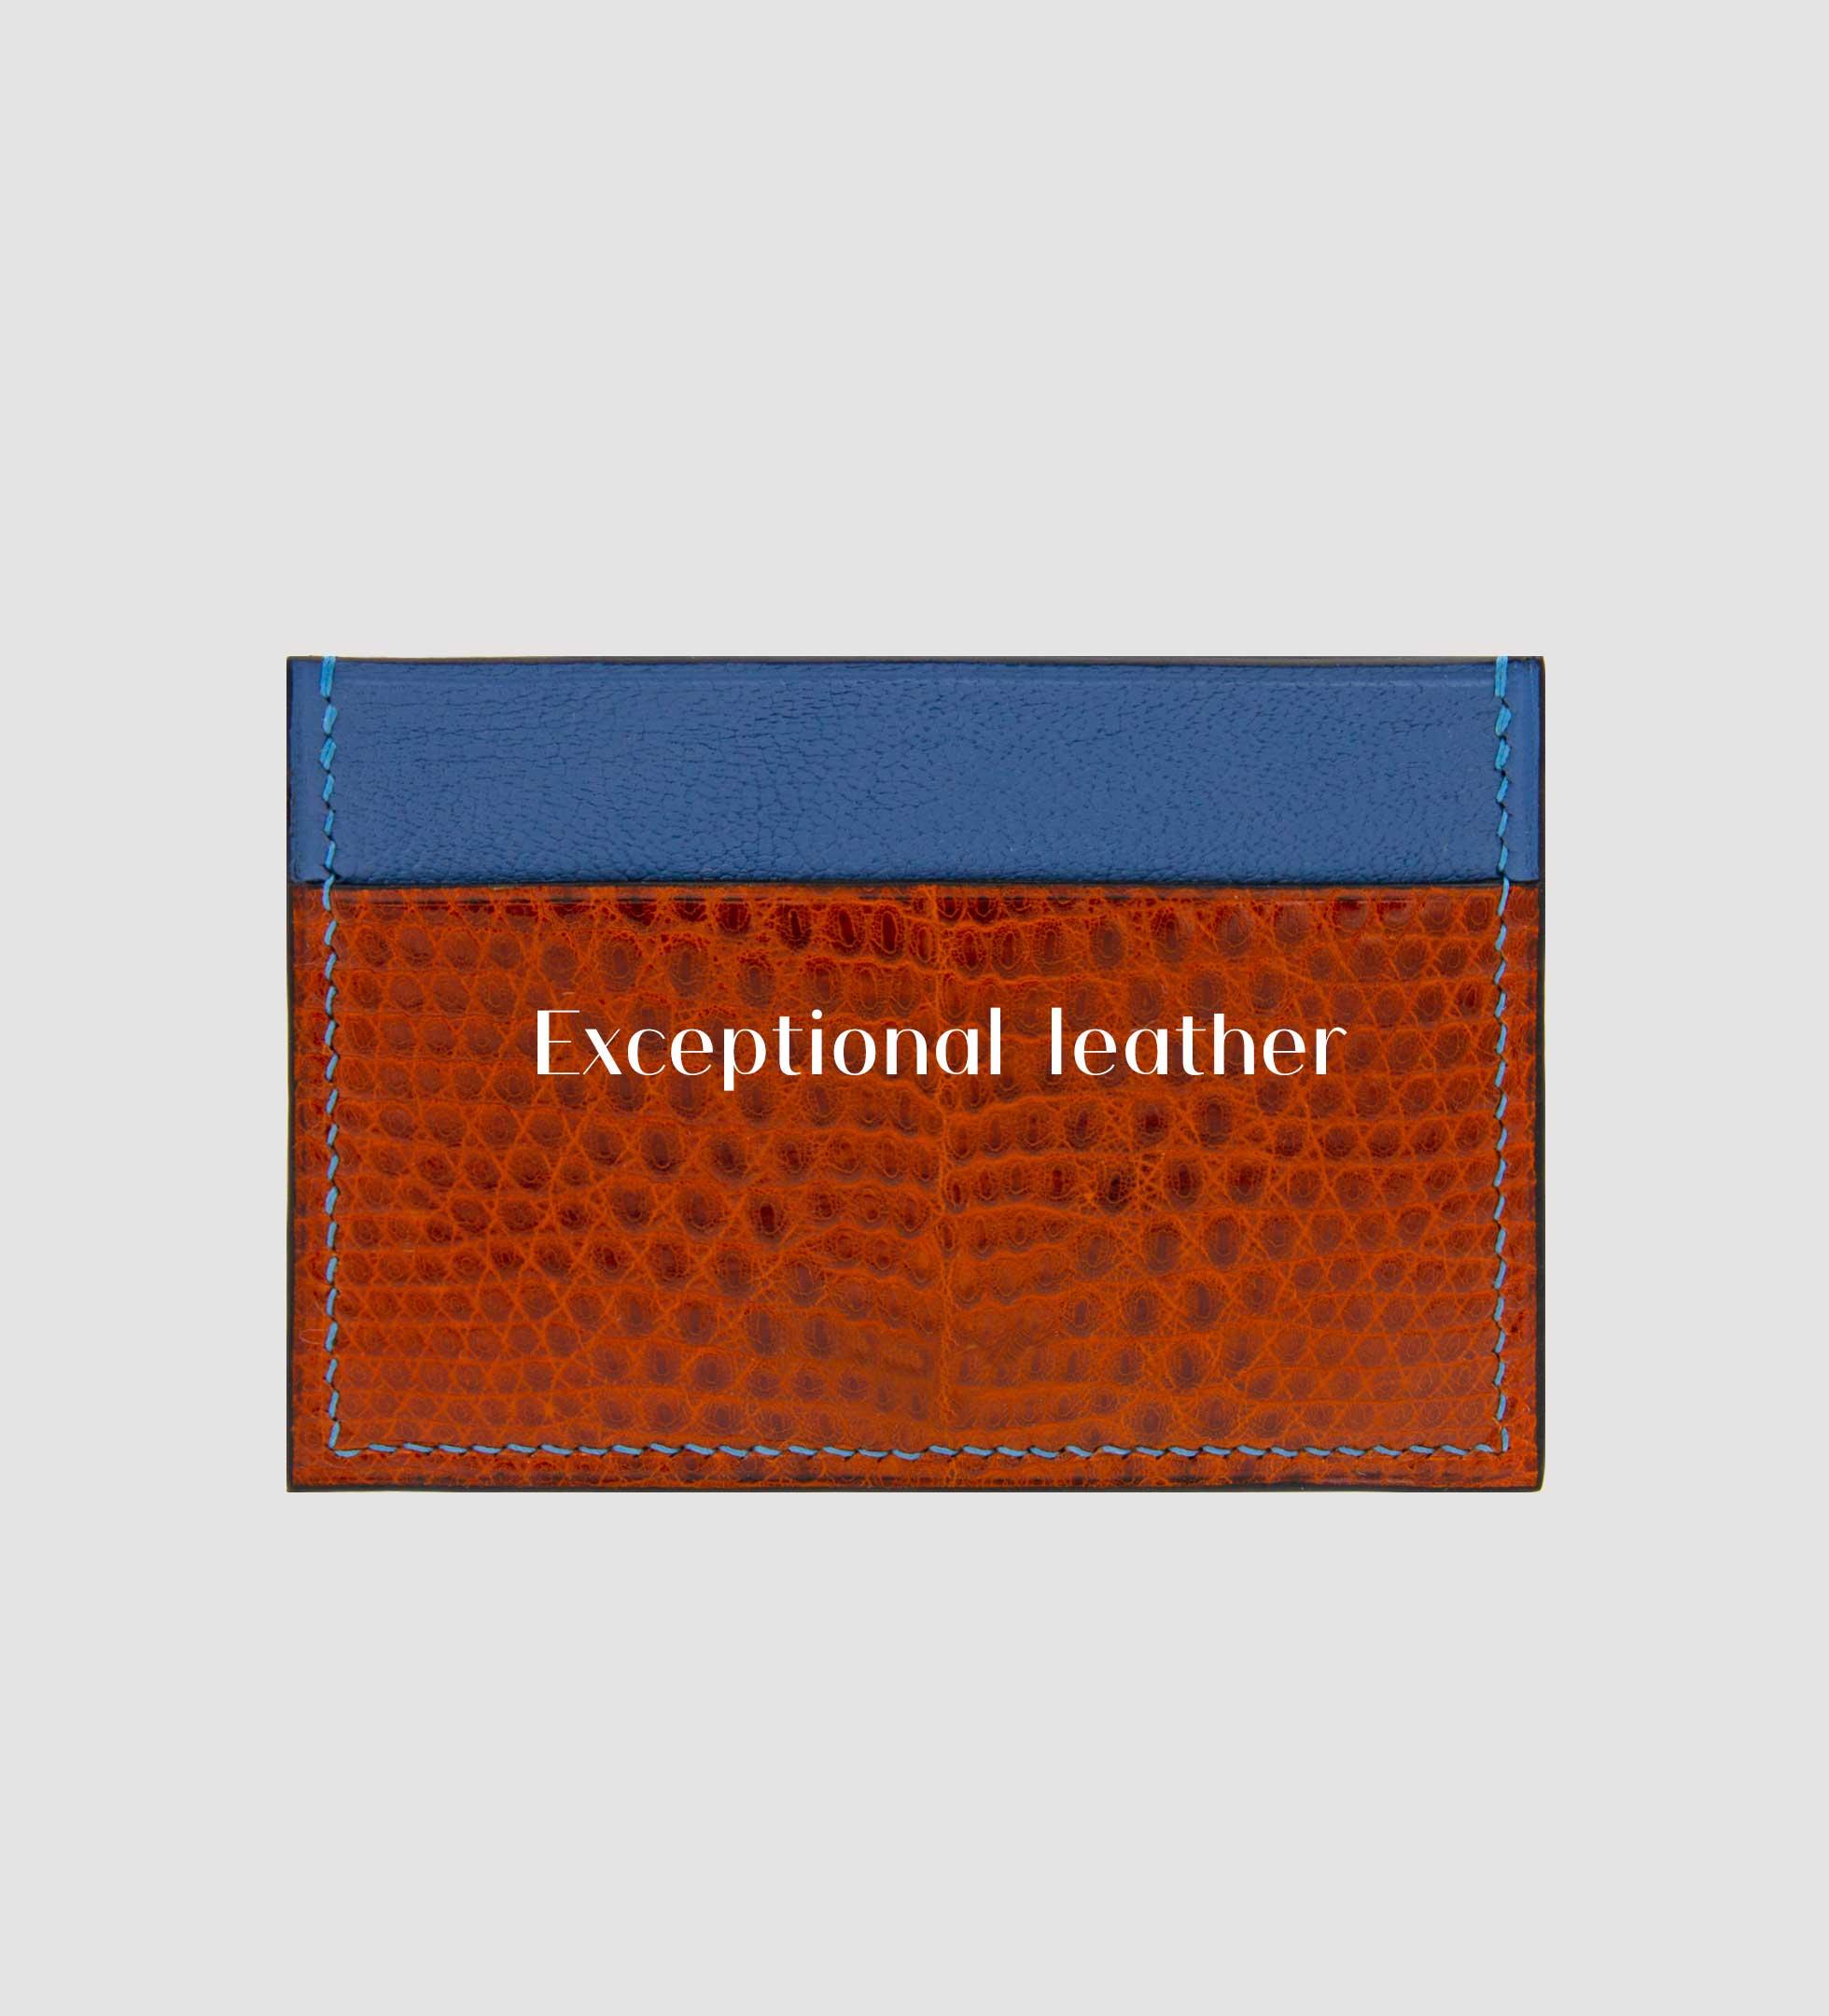 crivellaro fiche produits exceptional leather 490x540